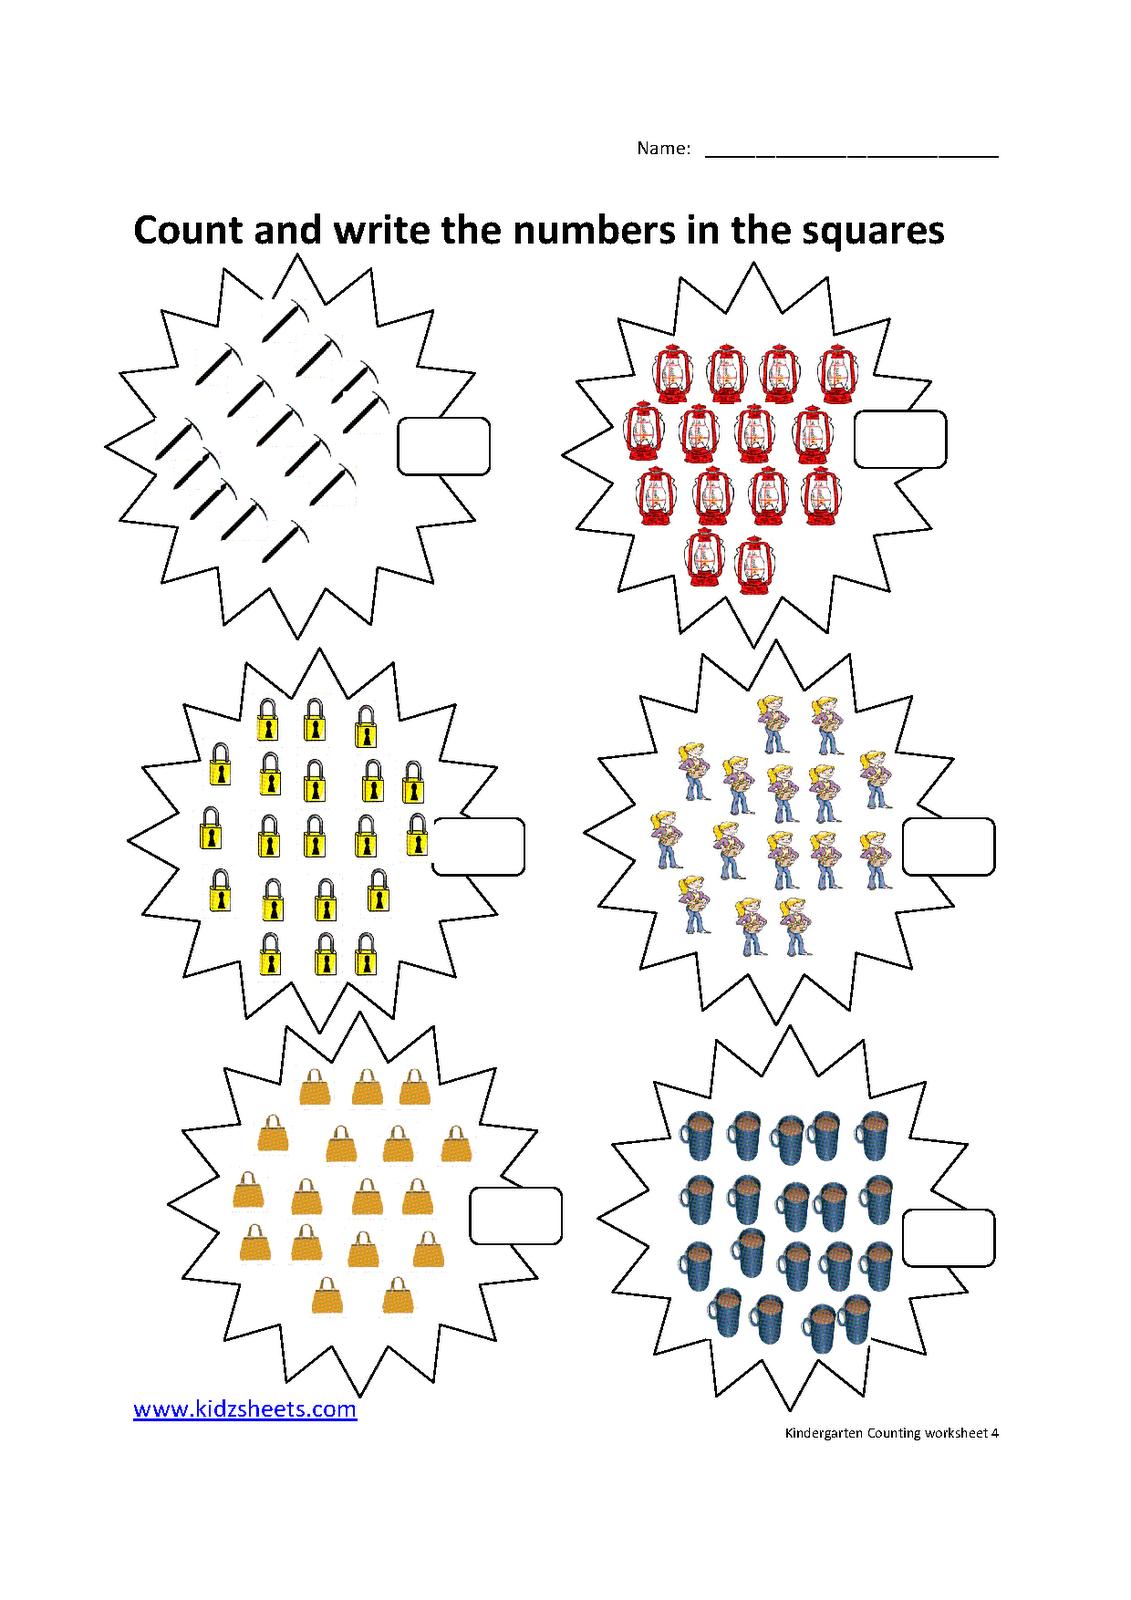 math worksheet : kidz worksheets kindergarten counting worksheet4 : Counting Worksheets For Kindergarten